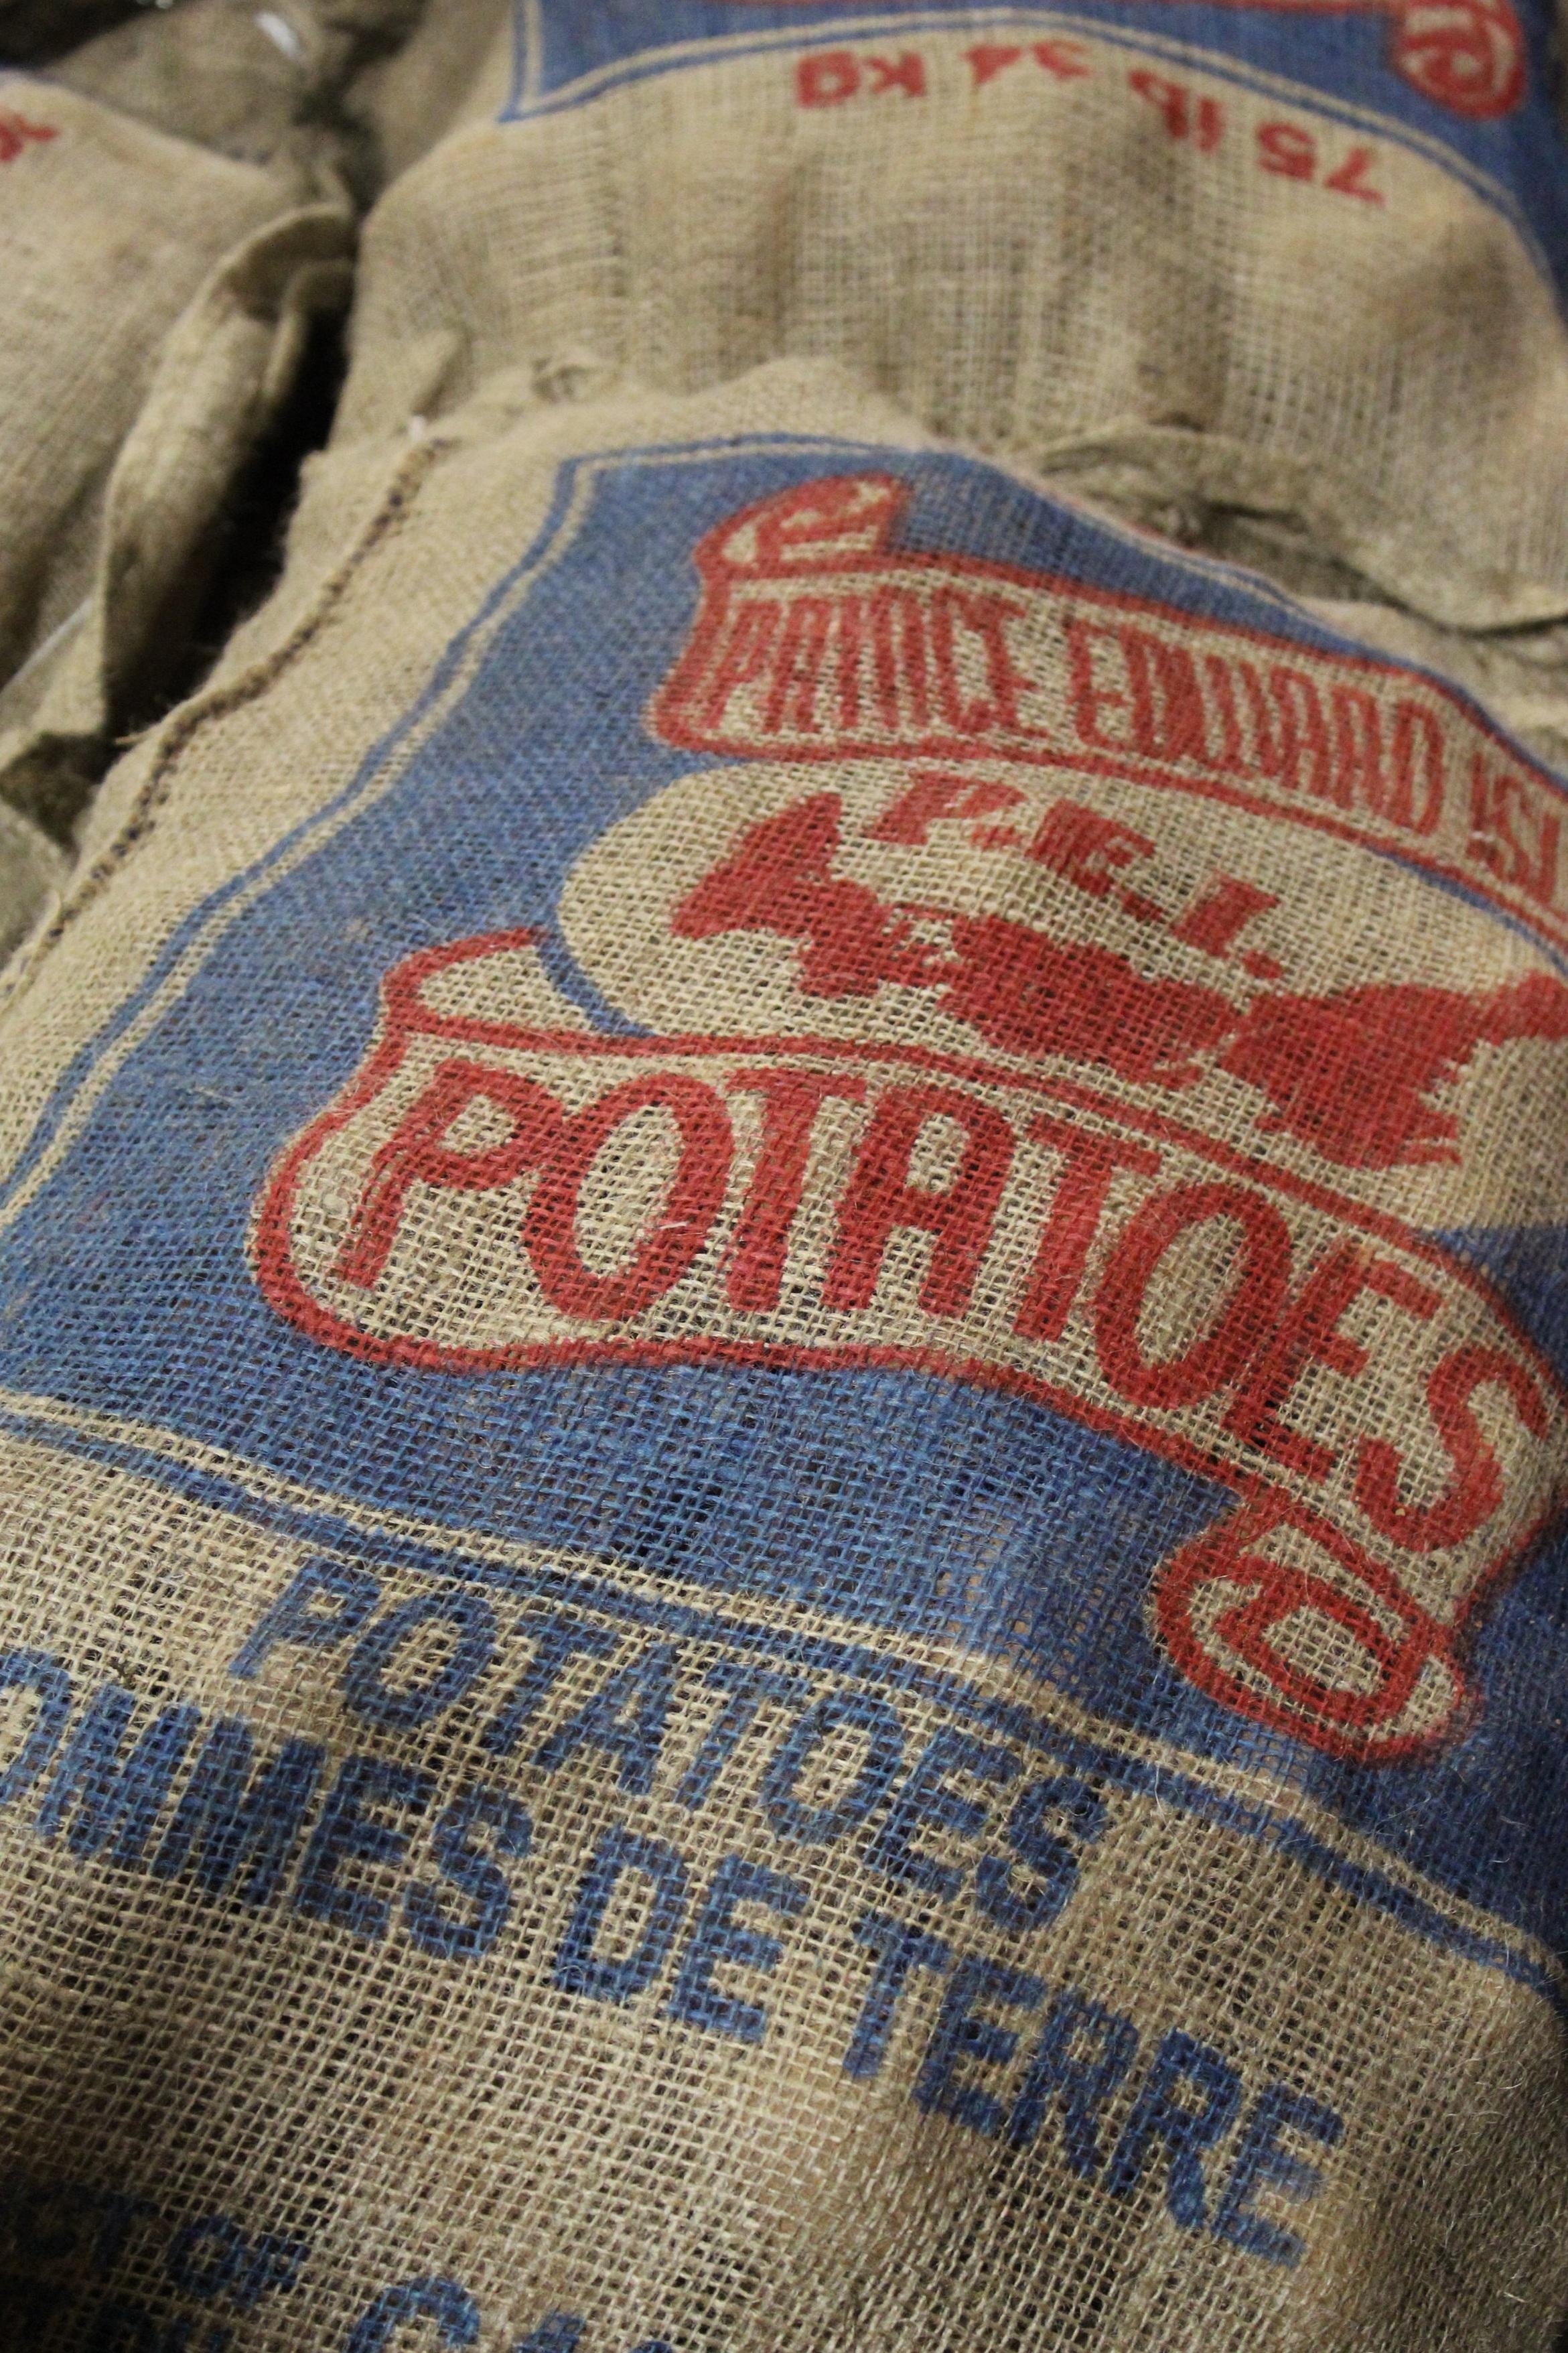 Best+Potato+Bag+Shot.jpg